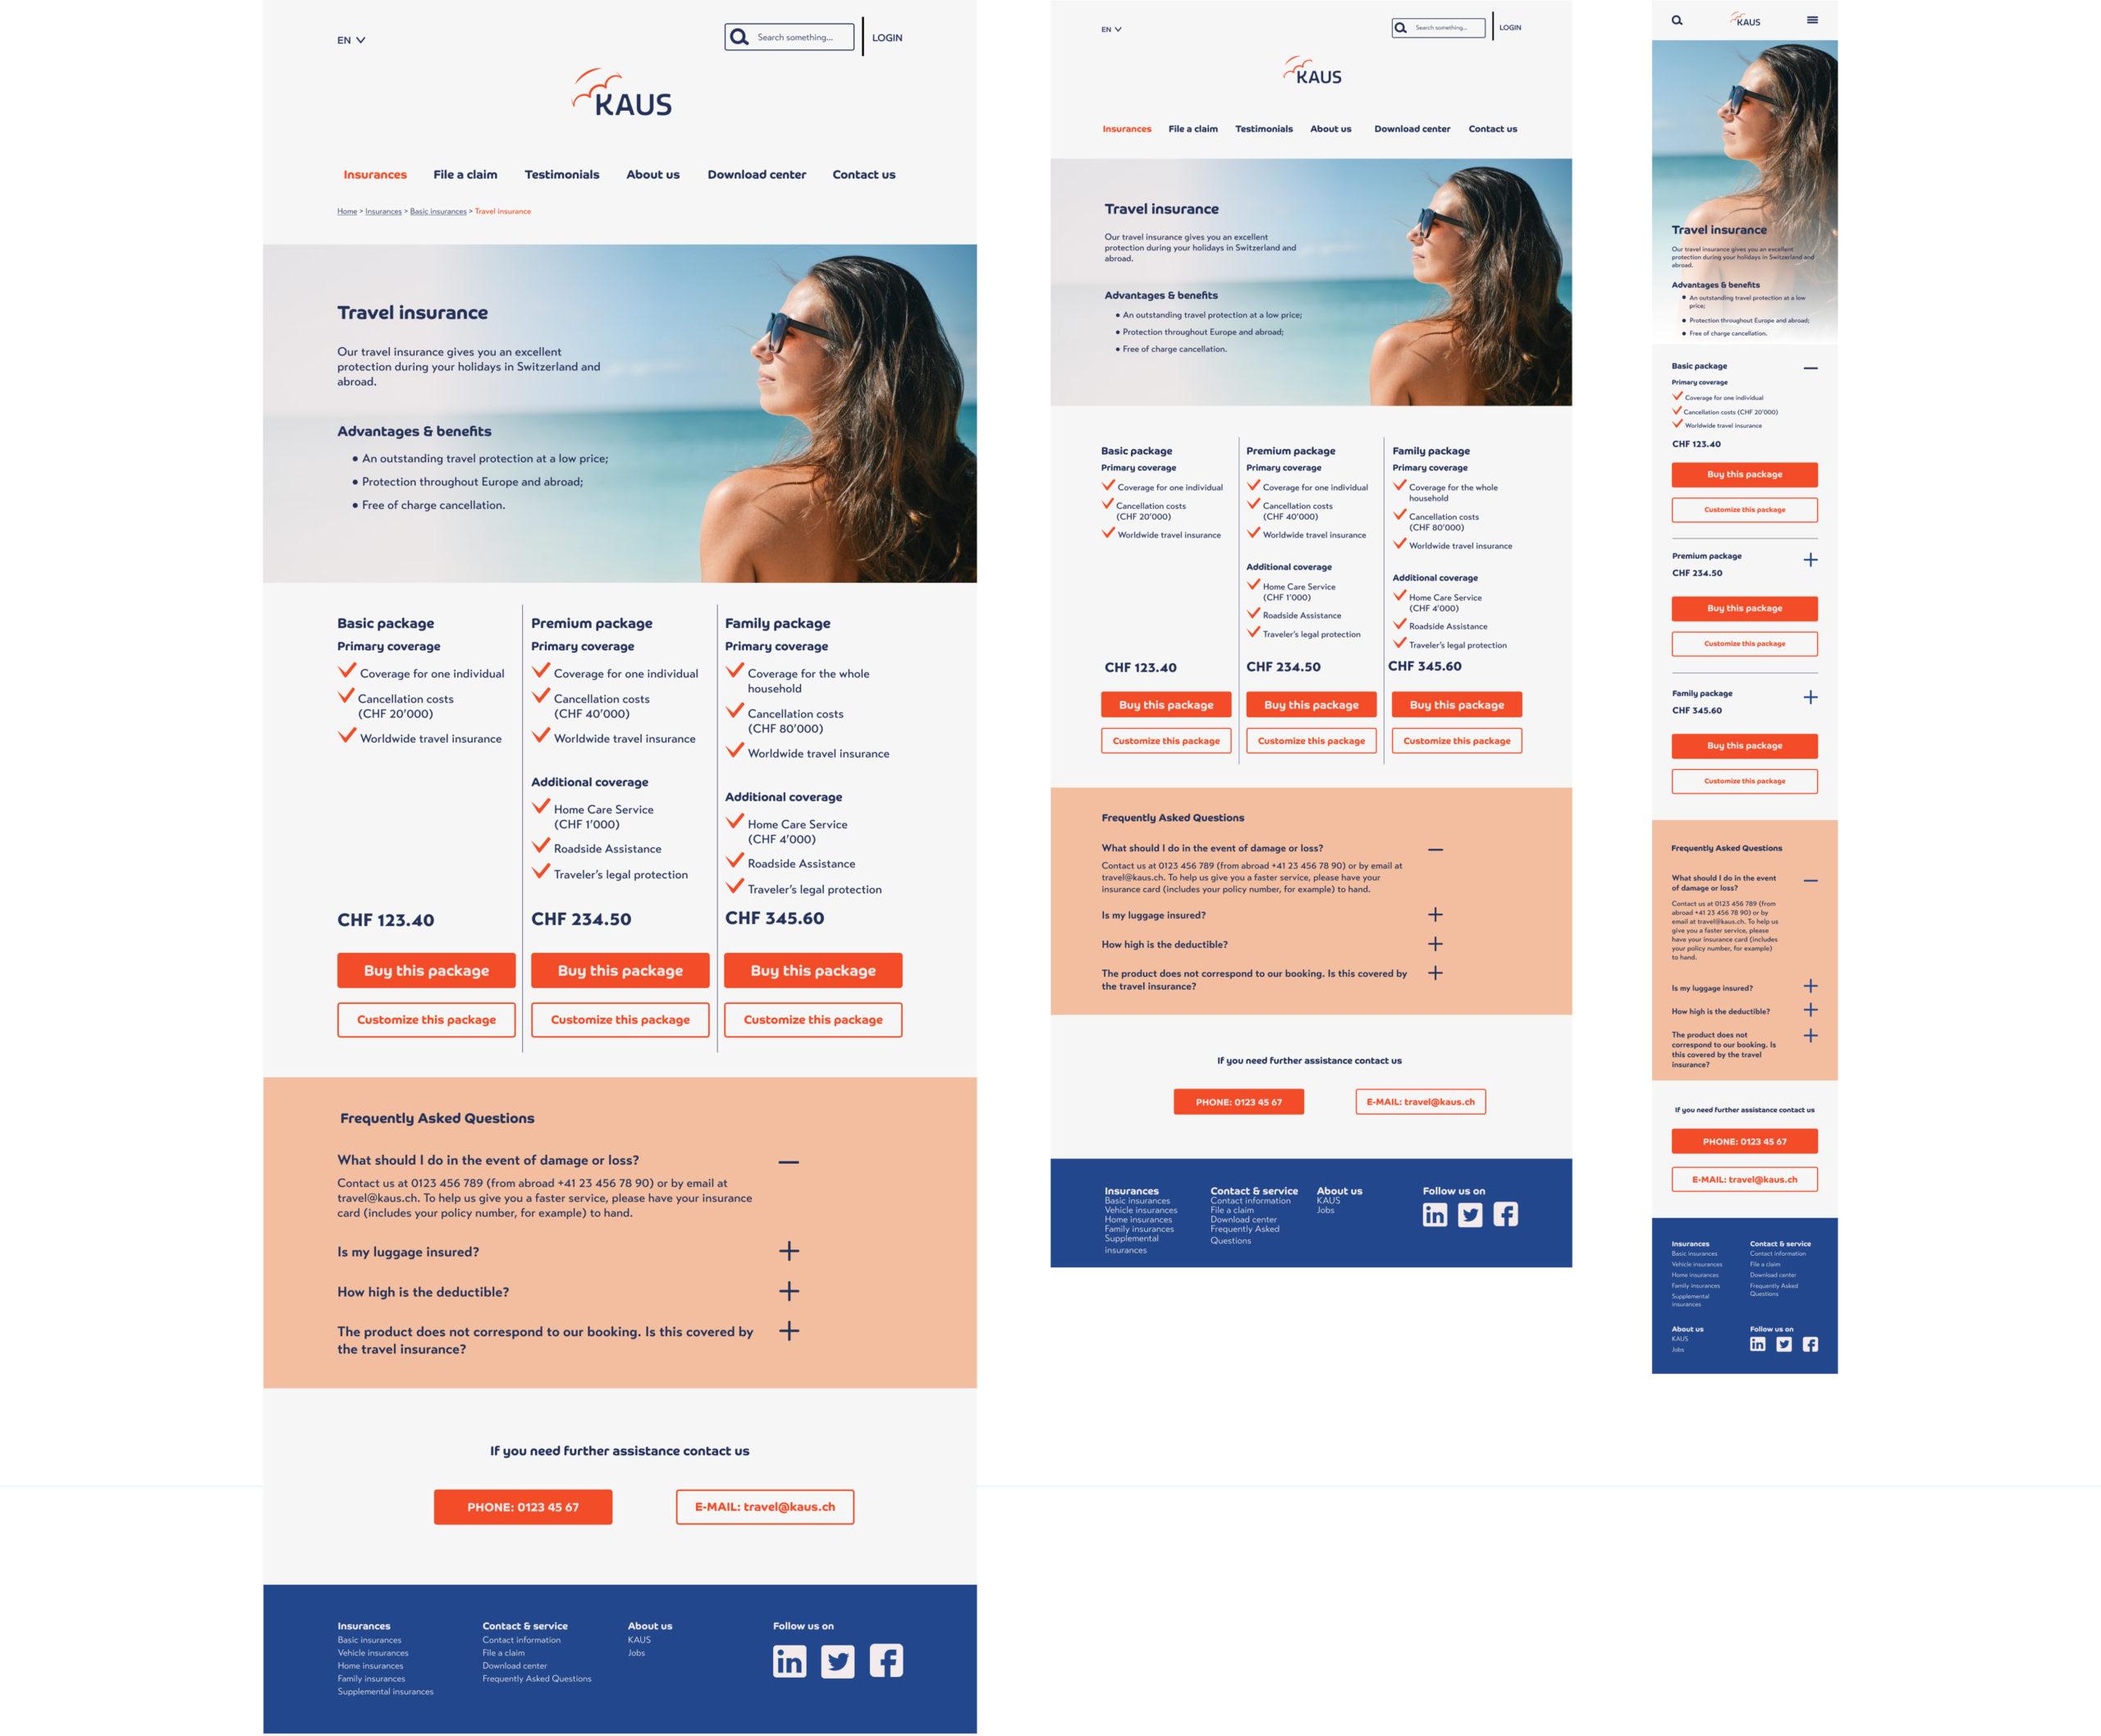 kaus_responsive_screens_mockups_inspage